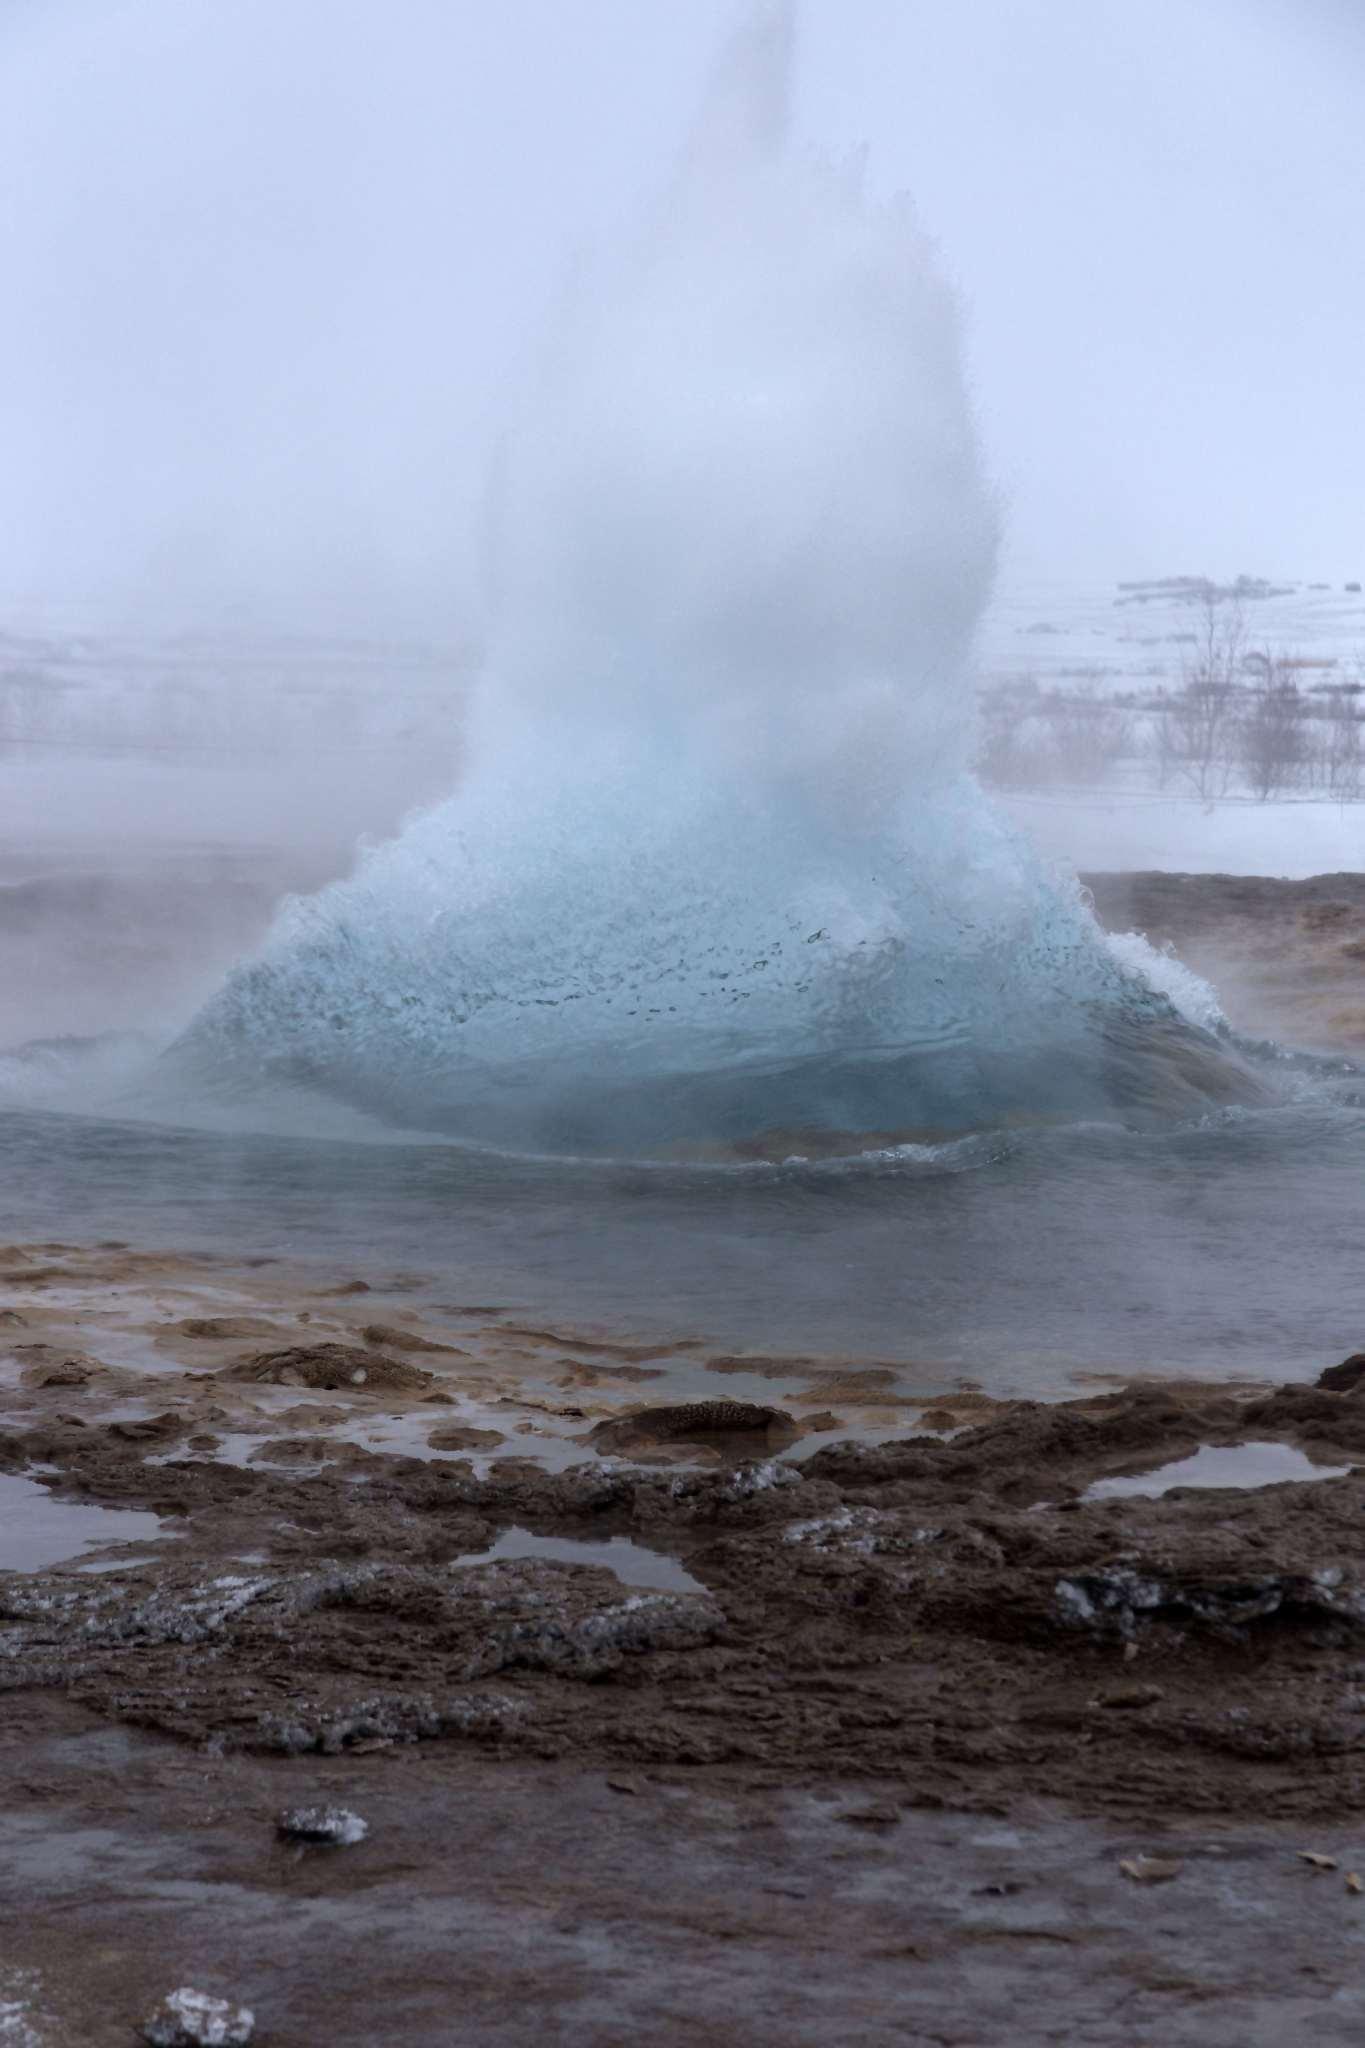 A geyser at Geysìr starts to blow